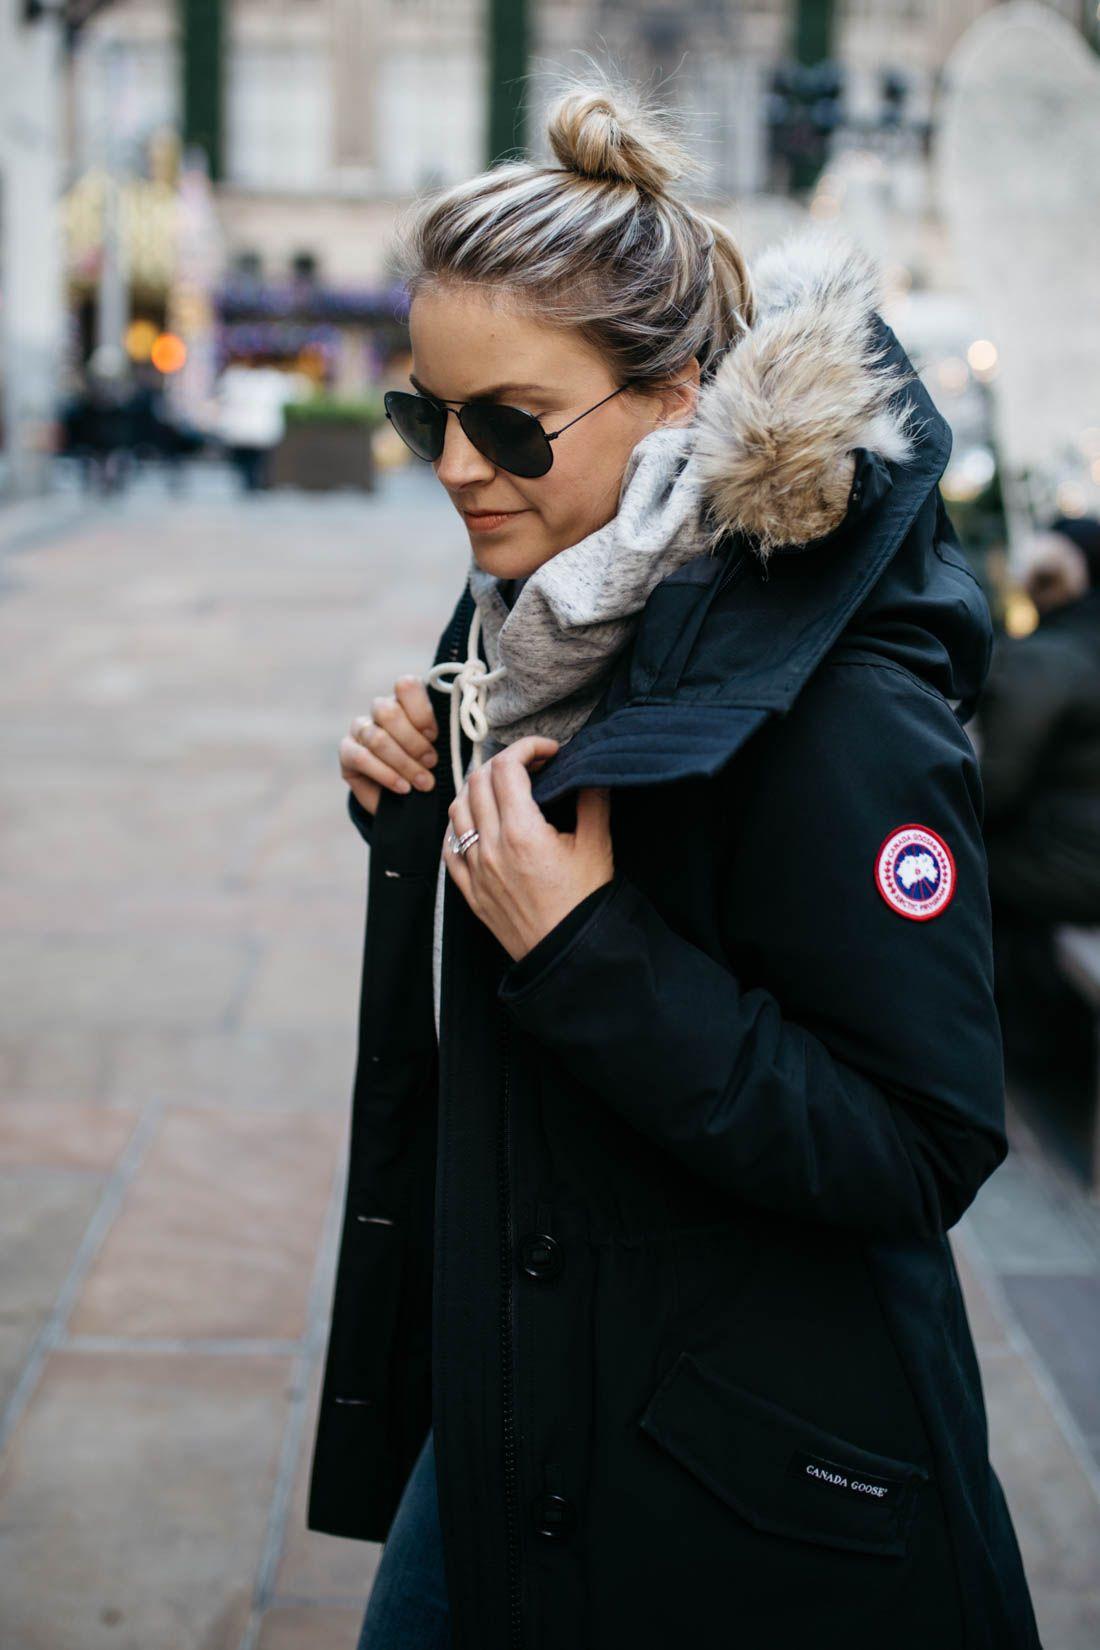 Canada Goose Jacket Winter Coats Winter Outfits Winter Outfits Canada Winter Outfits For Work